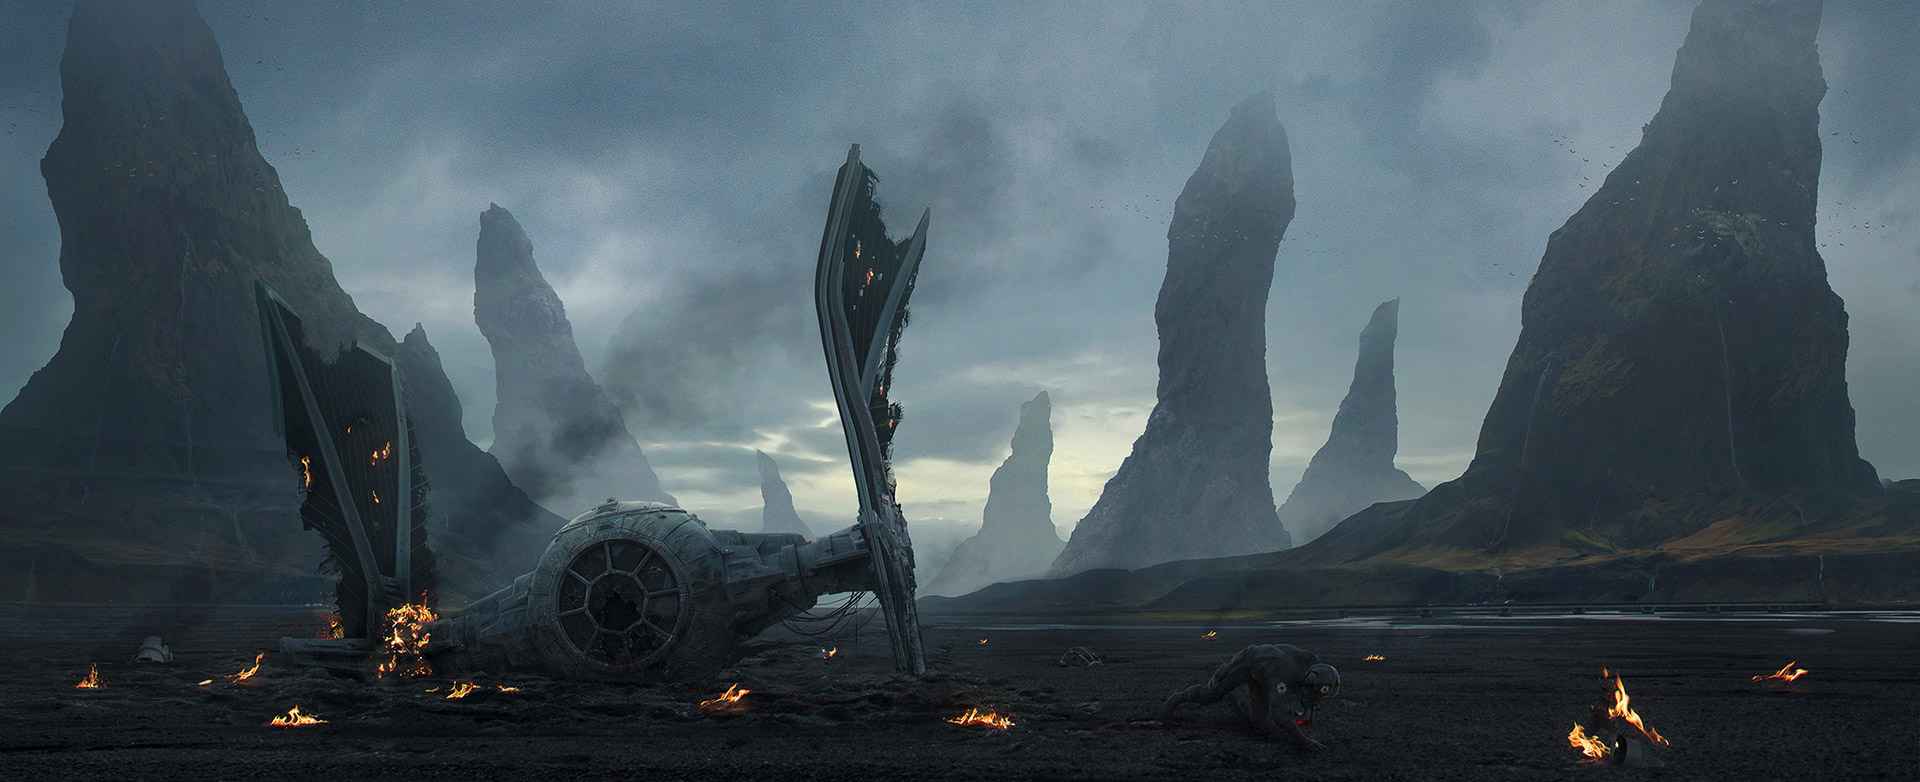 The Cinematic Sci-Fi Art of Nikita Pilyukshin